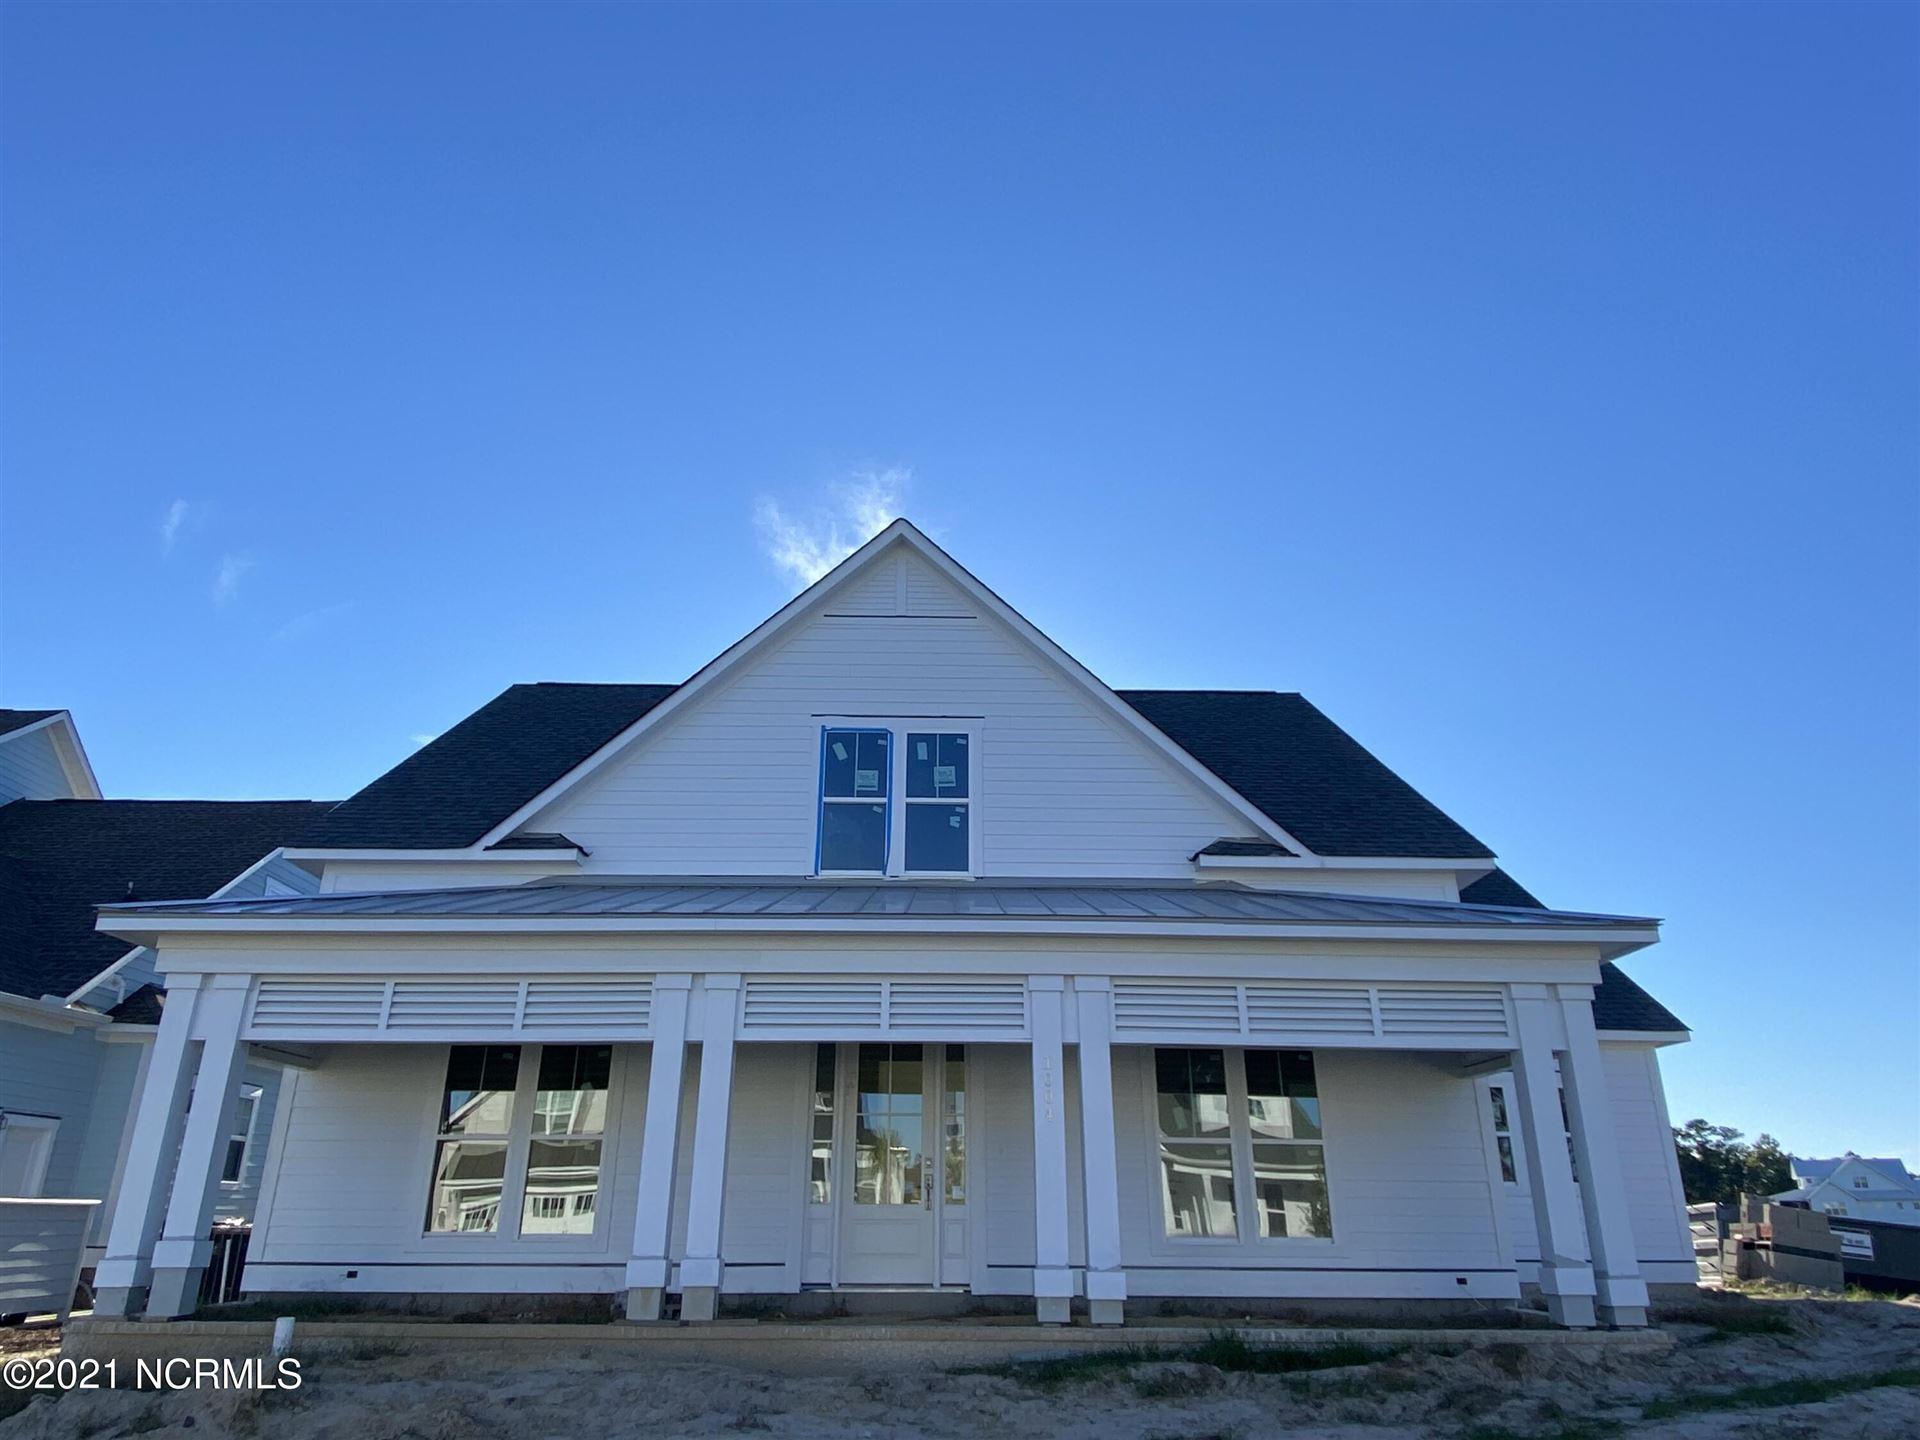 Photo of 1004 Cranford Drive, Wilmington, NC 28411 (MLS # 100288452)